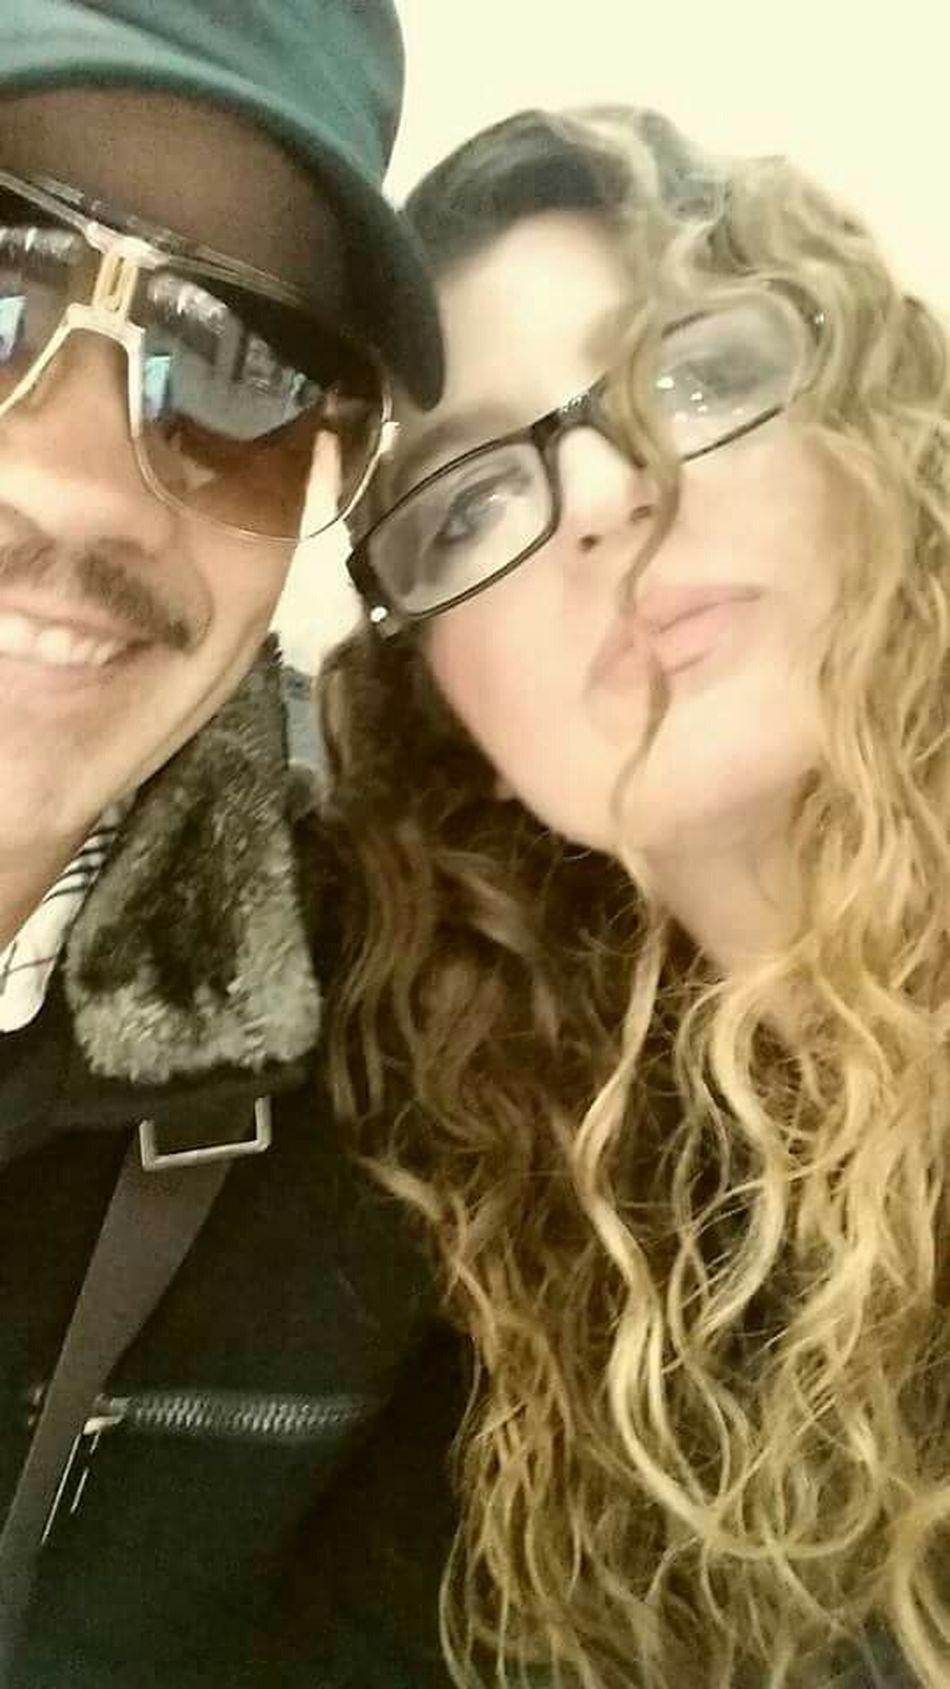 That's Me Hi! Me And Wife  Smile ✌ Streamzoo Family Sardinia Sardegna Italy  Hello Friends :) Love ♥ My FaceBook Hello World